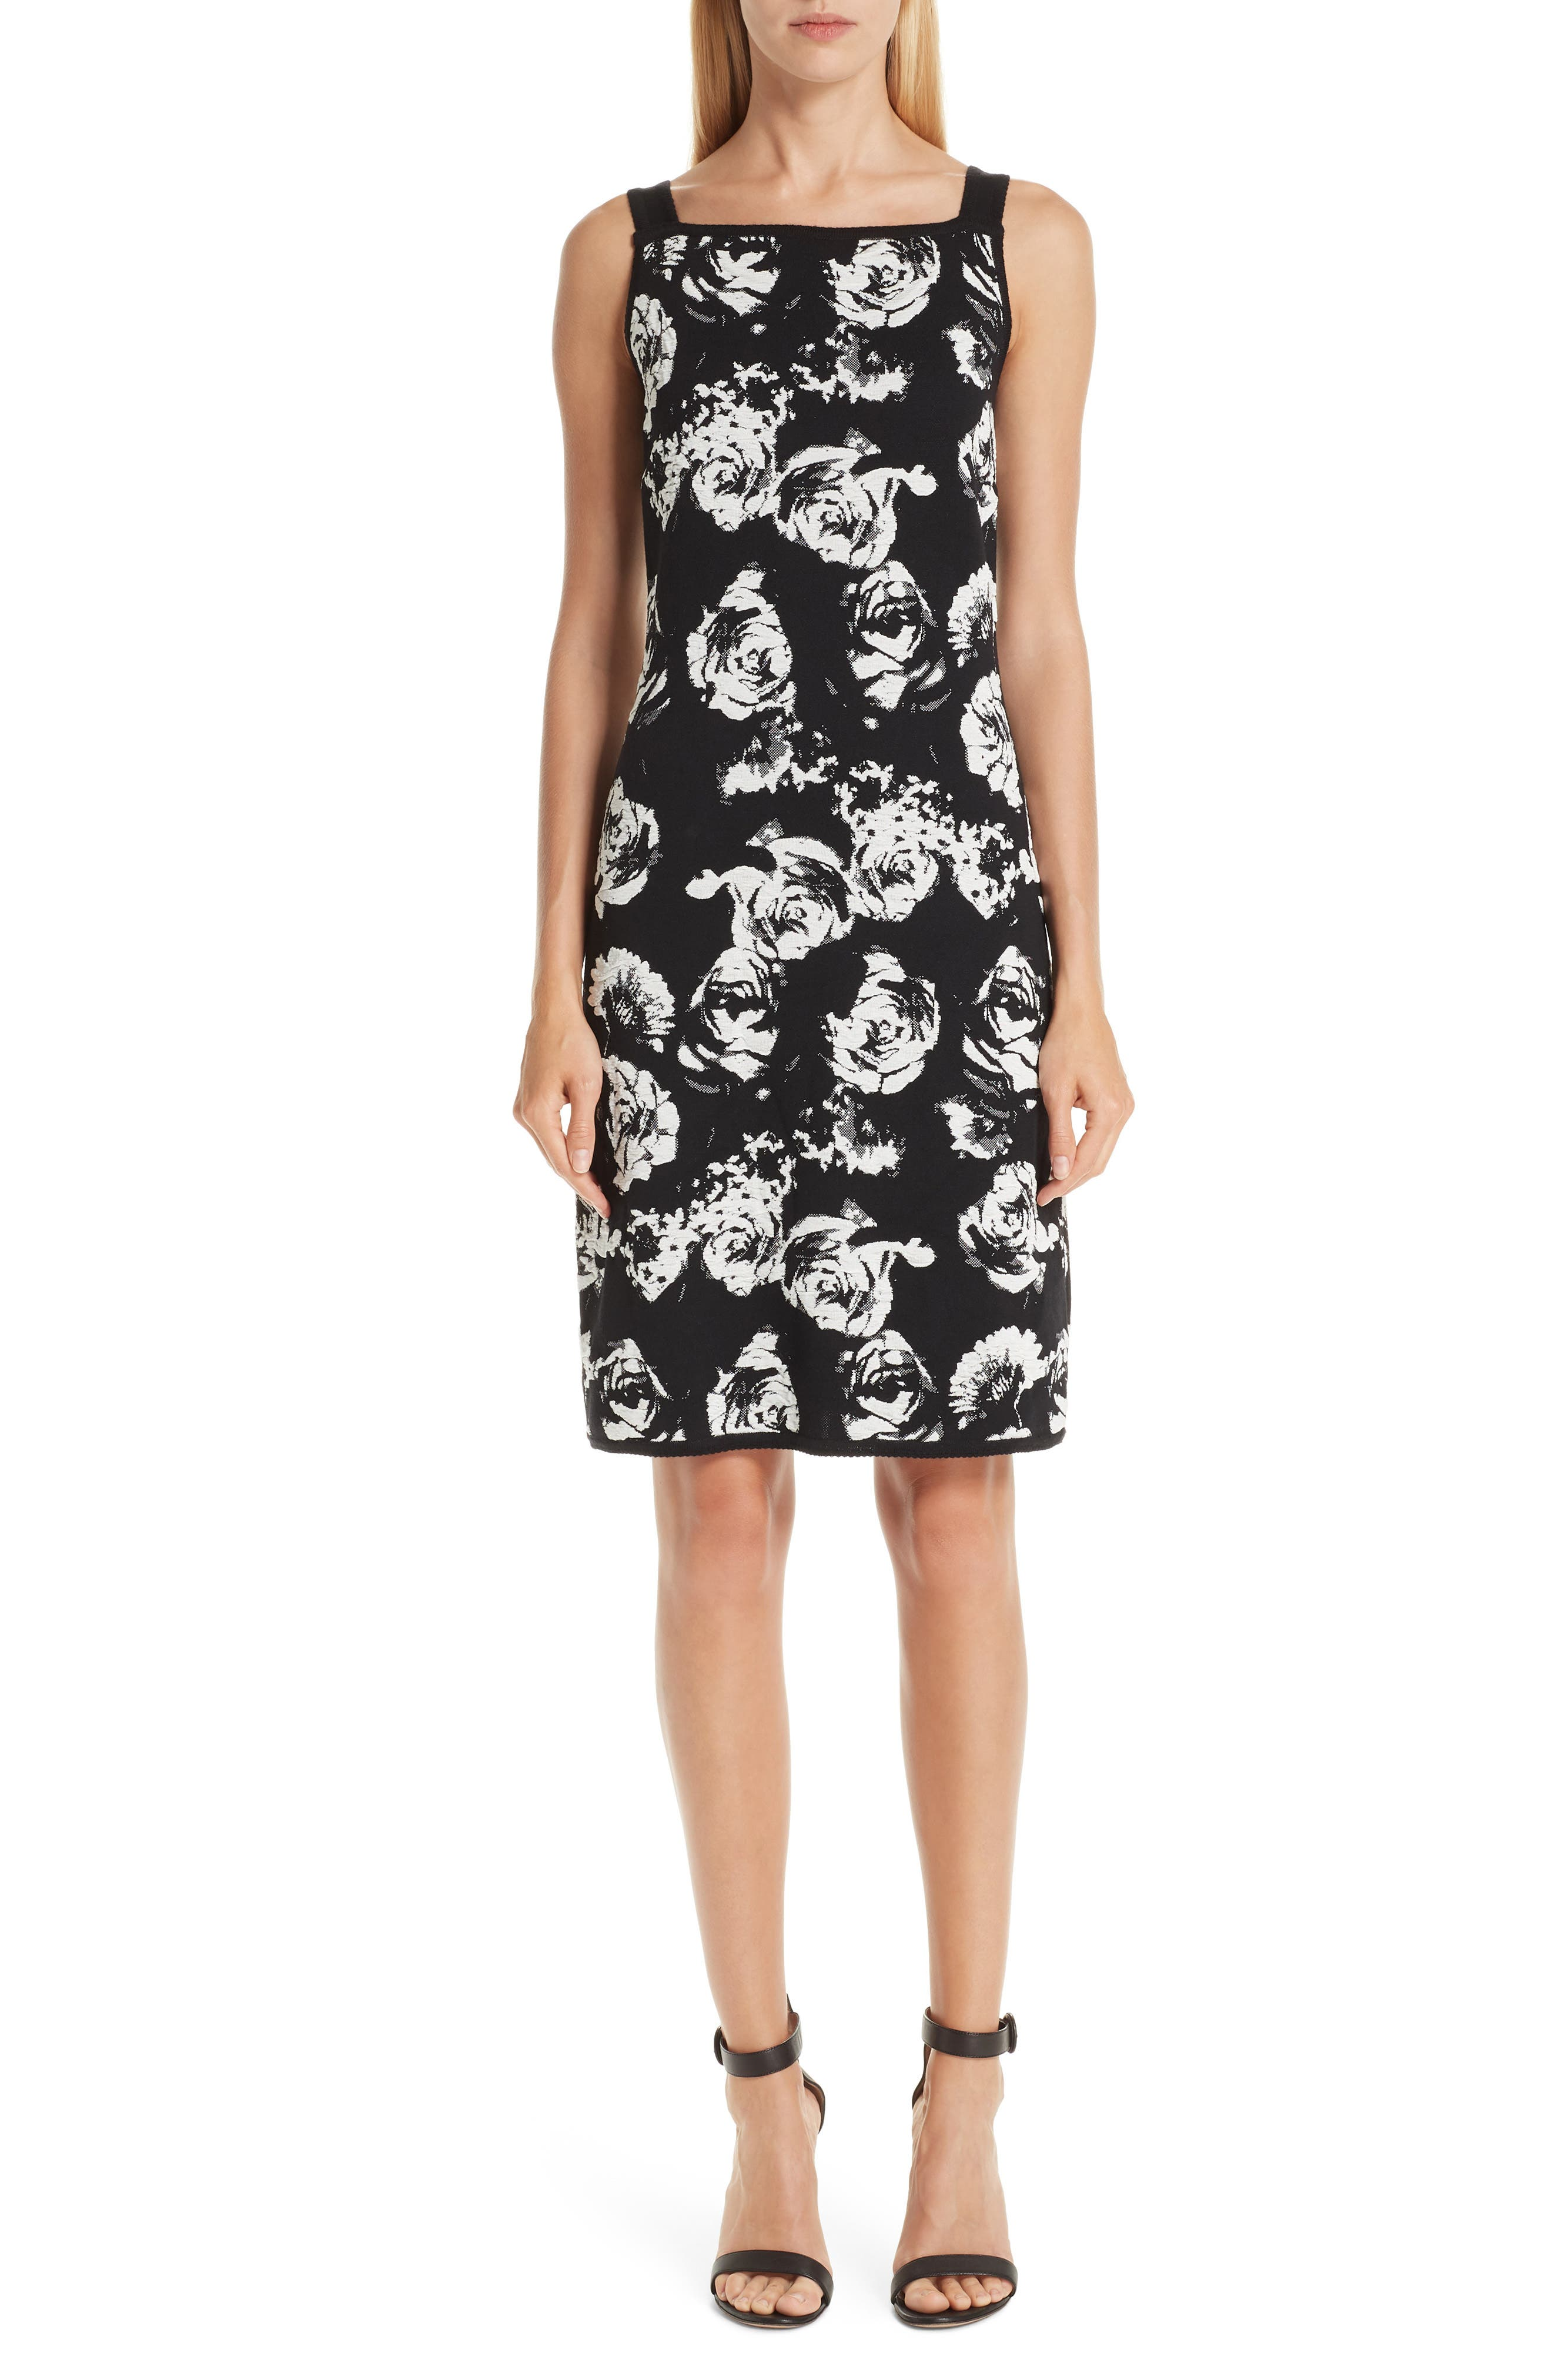 St. John Collection Blister Floral Knit Dress, Black